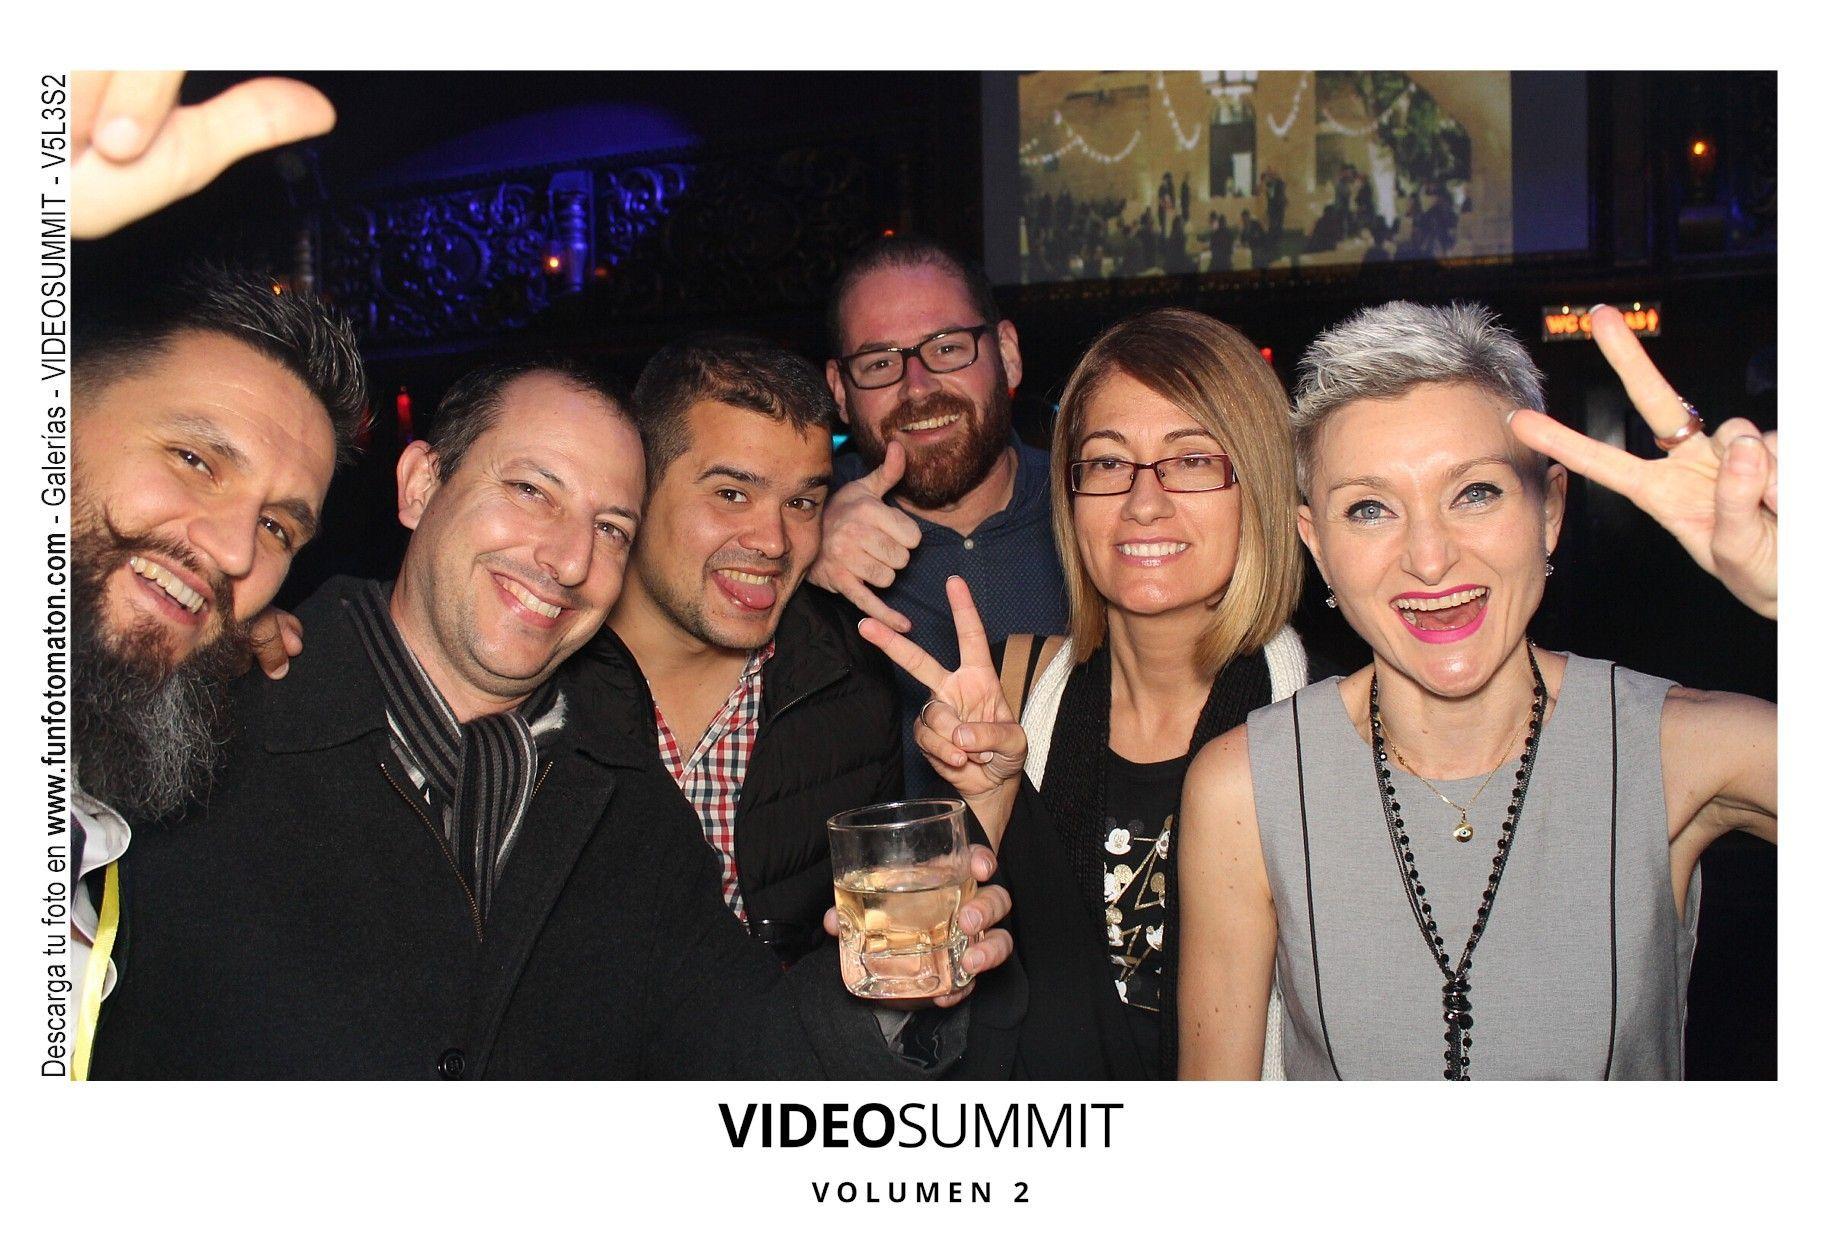 videosummit-vol2-club-party-006